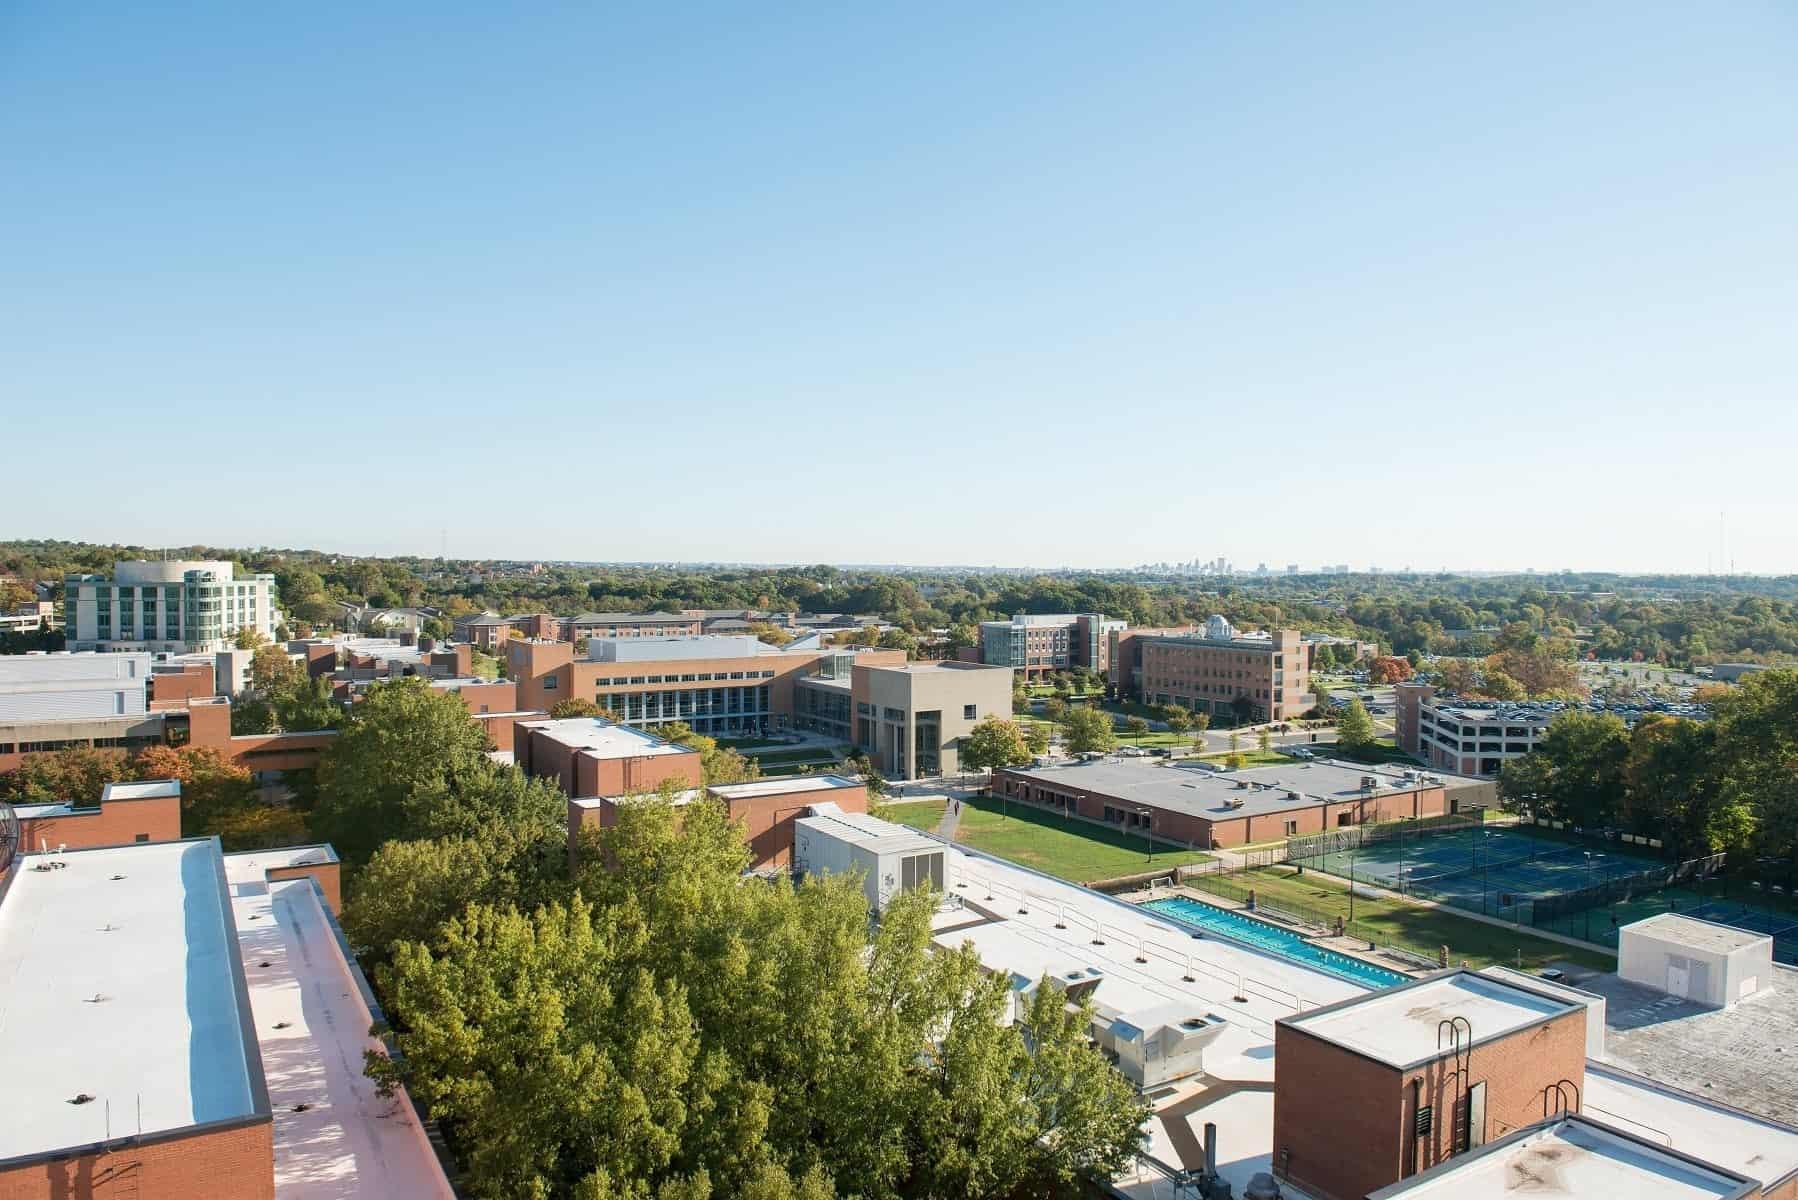 University Maryland Baltimore County